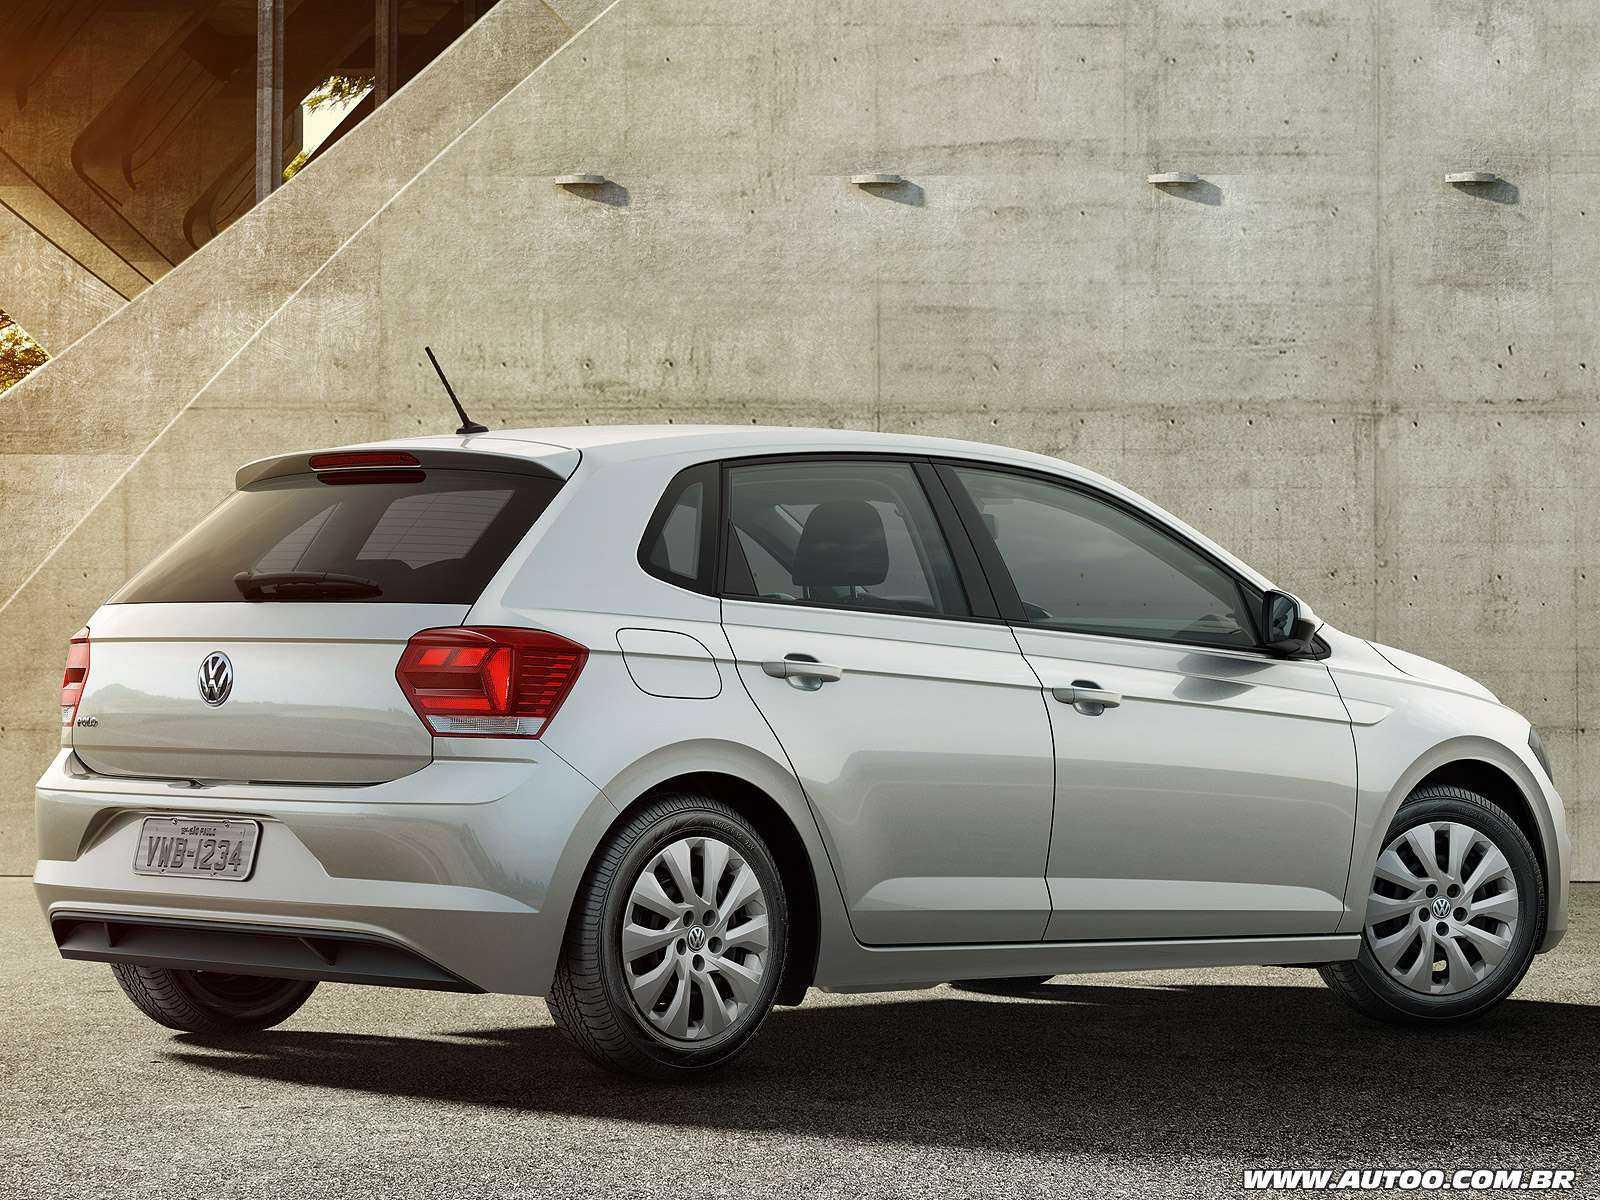 VolkswagenPolo 2018 - ângulo traseiro